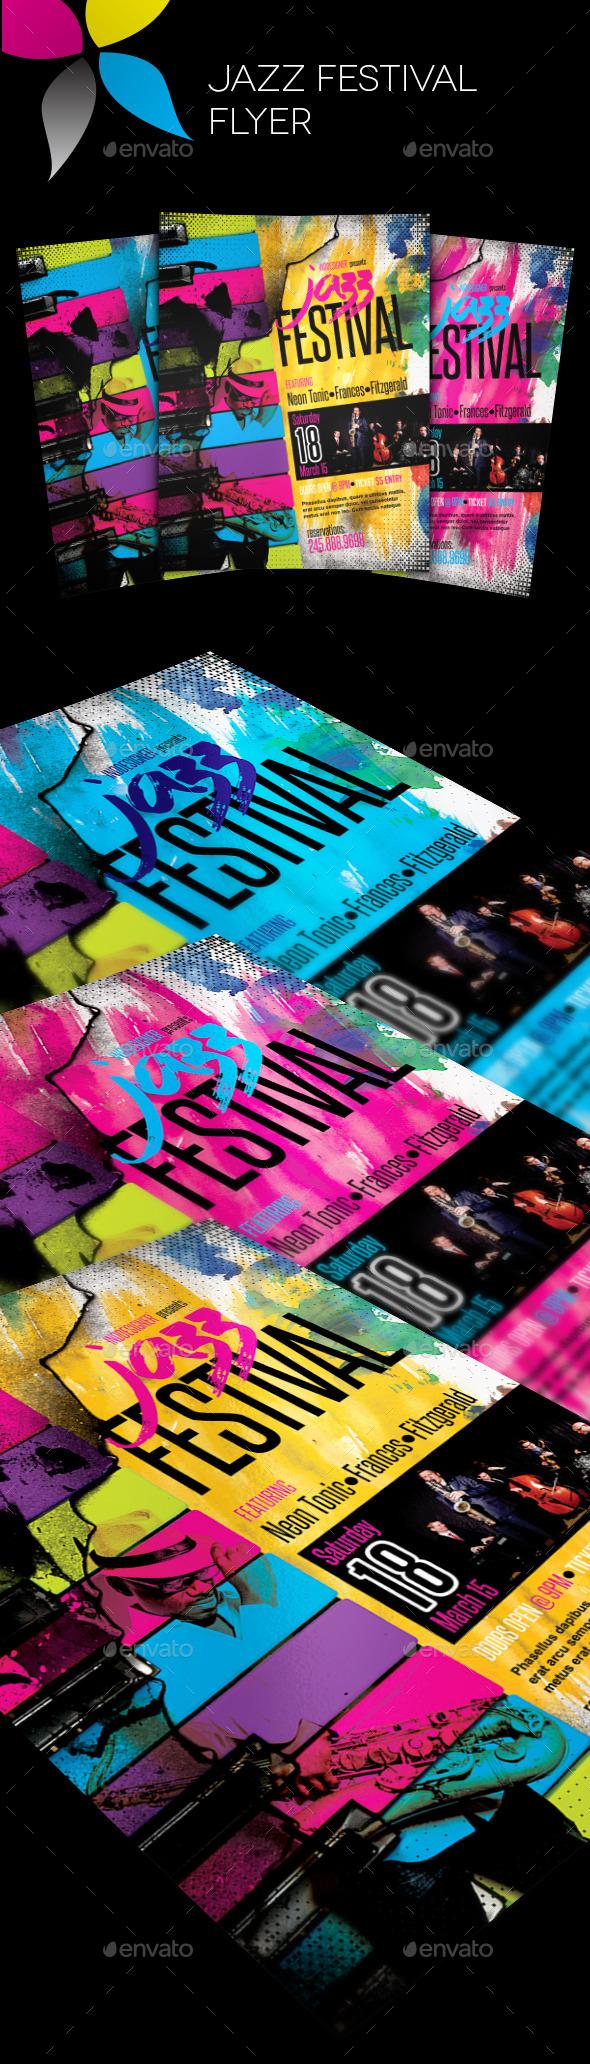 GraphicRiver Jazz Festival Flyer 11556908